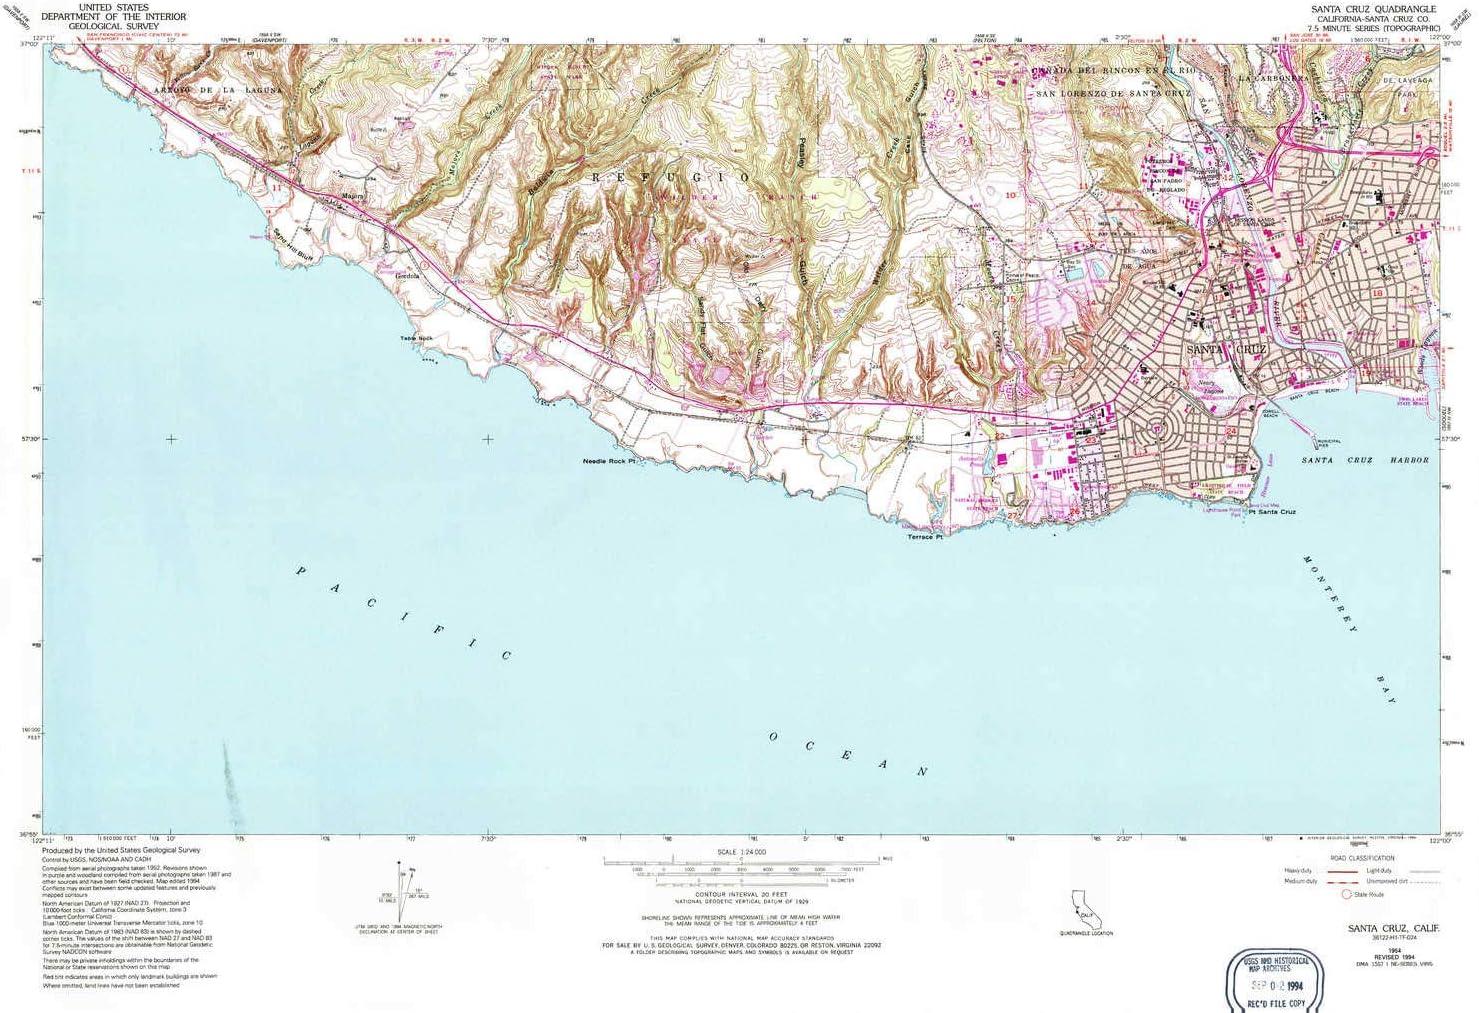 YellowMaps Santa Cruz CA topo map 1:24000 Minu 7.5 Scale X Selling and Free Shipping Cheap Bargain Gift selling